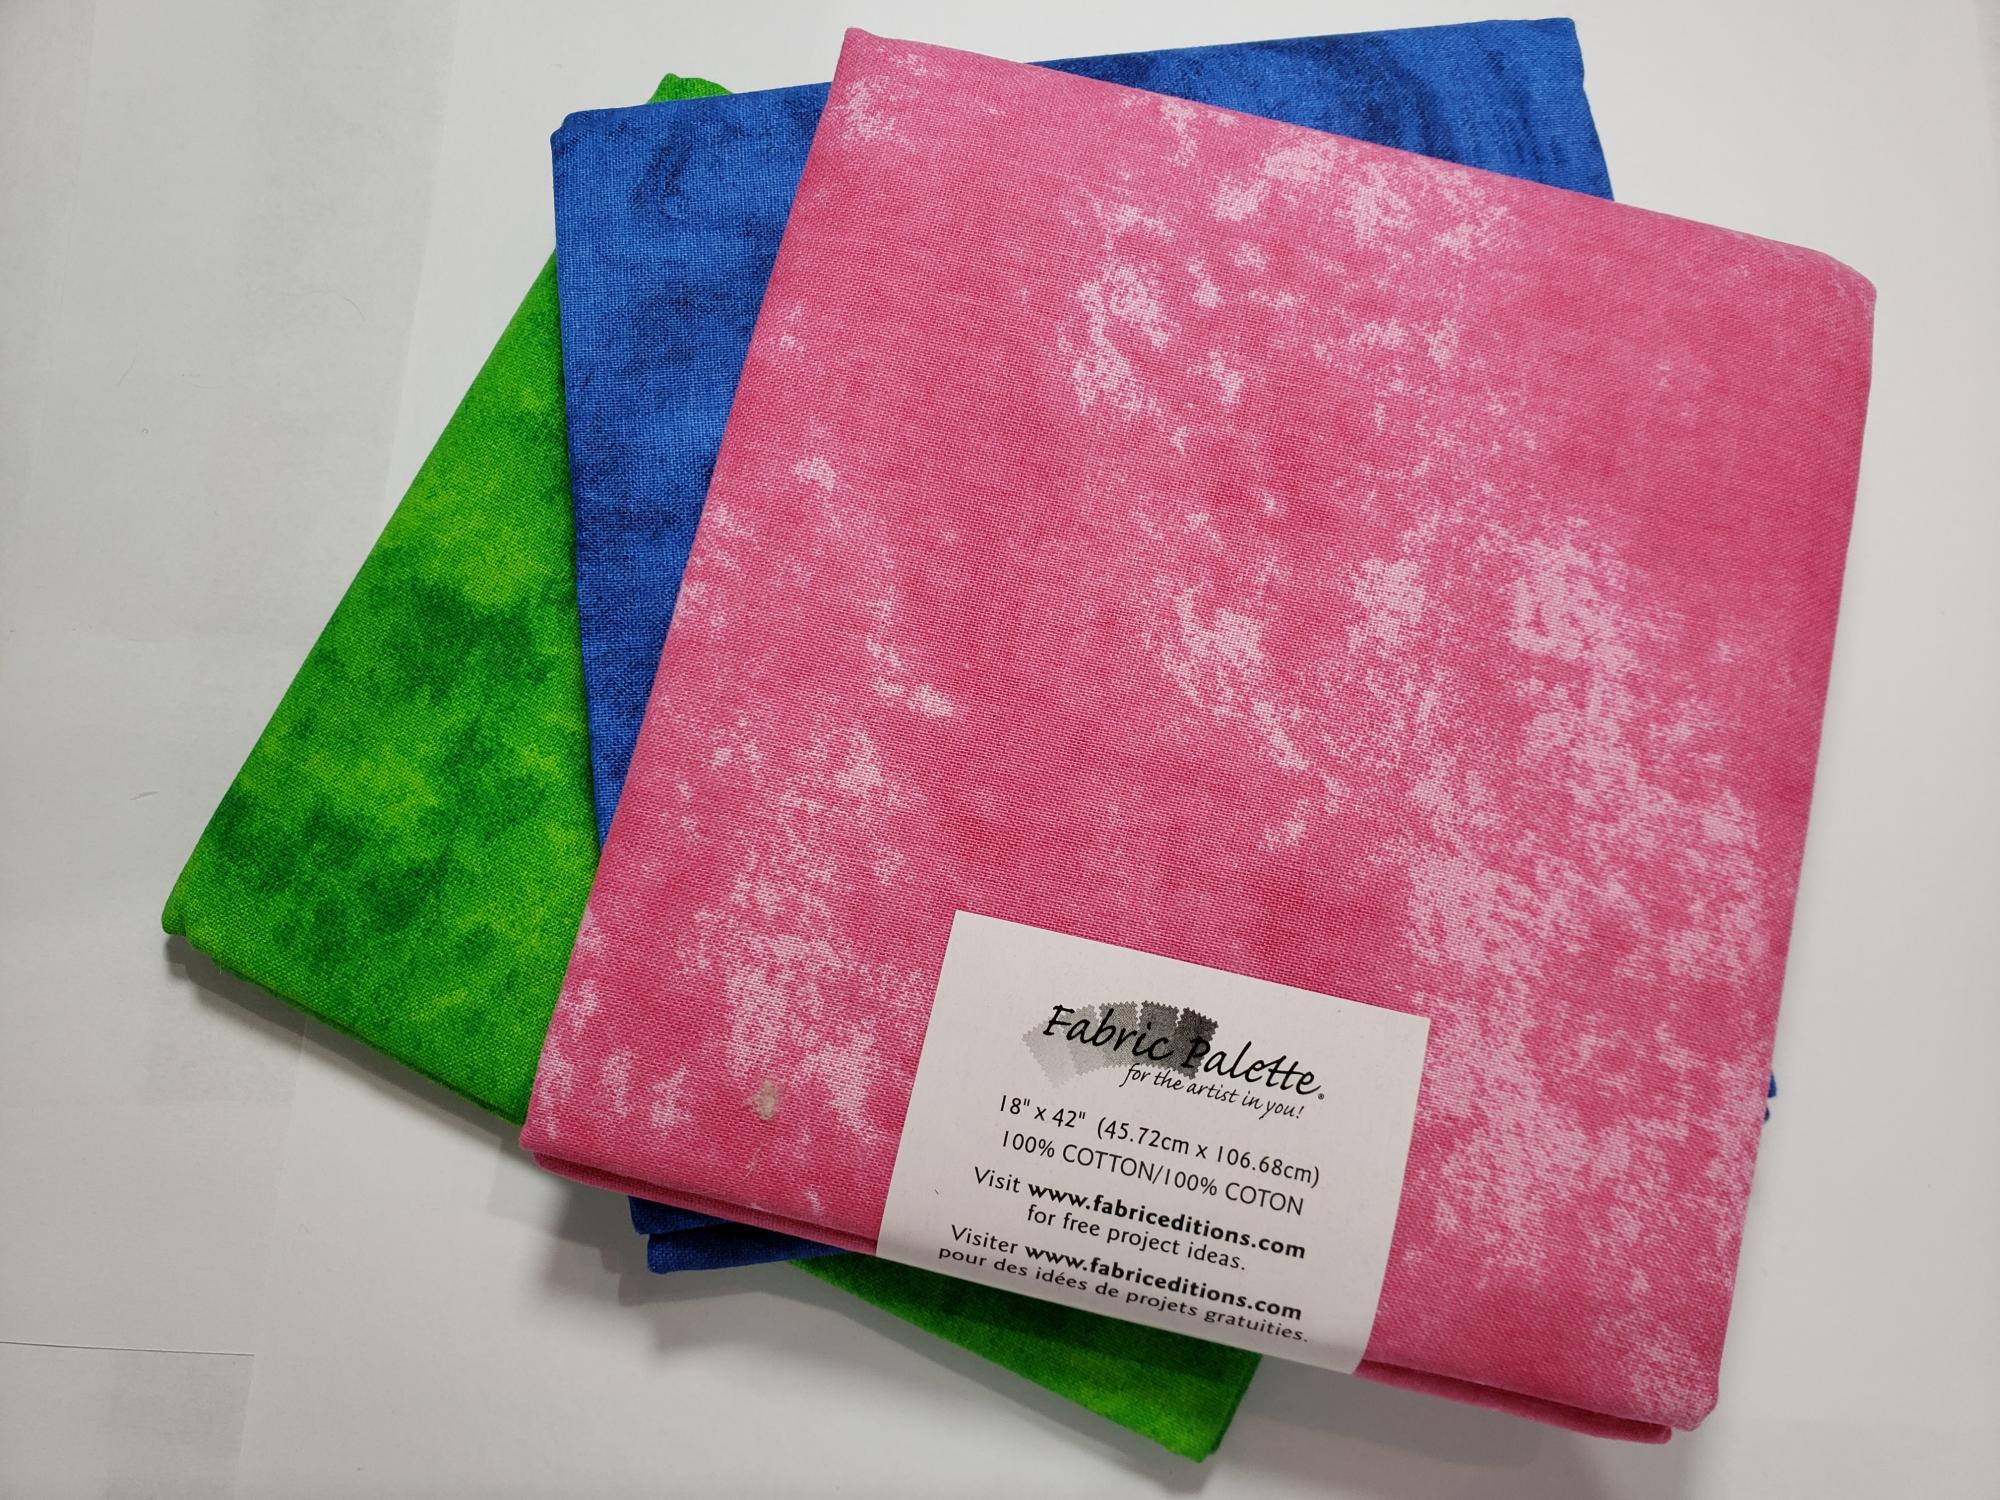 Half Yard Bundles (3 x 18x42) Pink/Blue/Grn